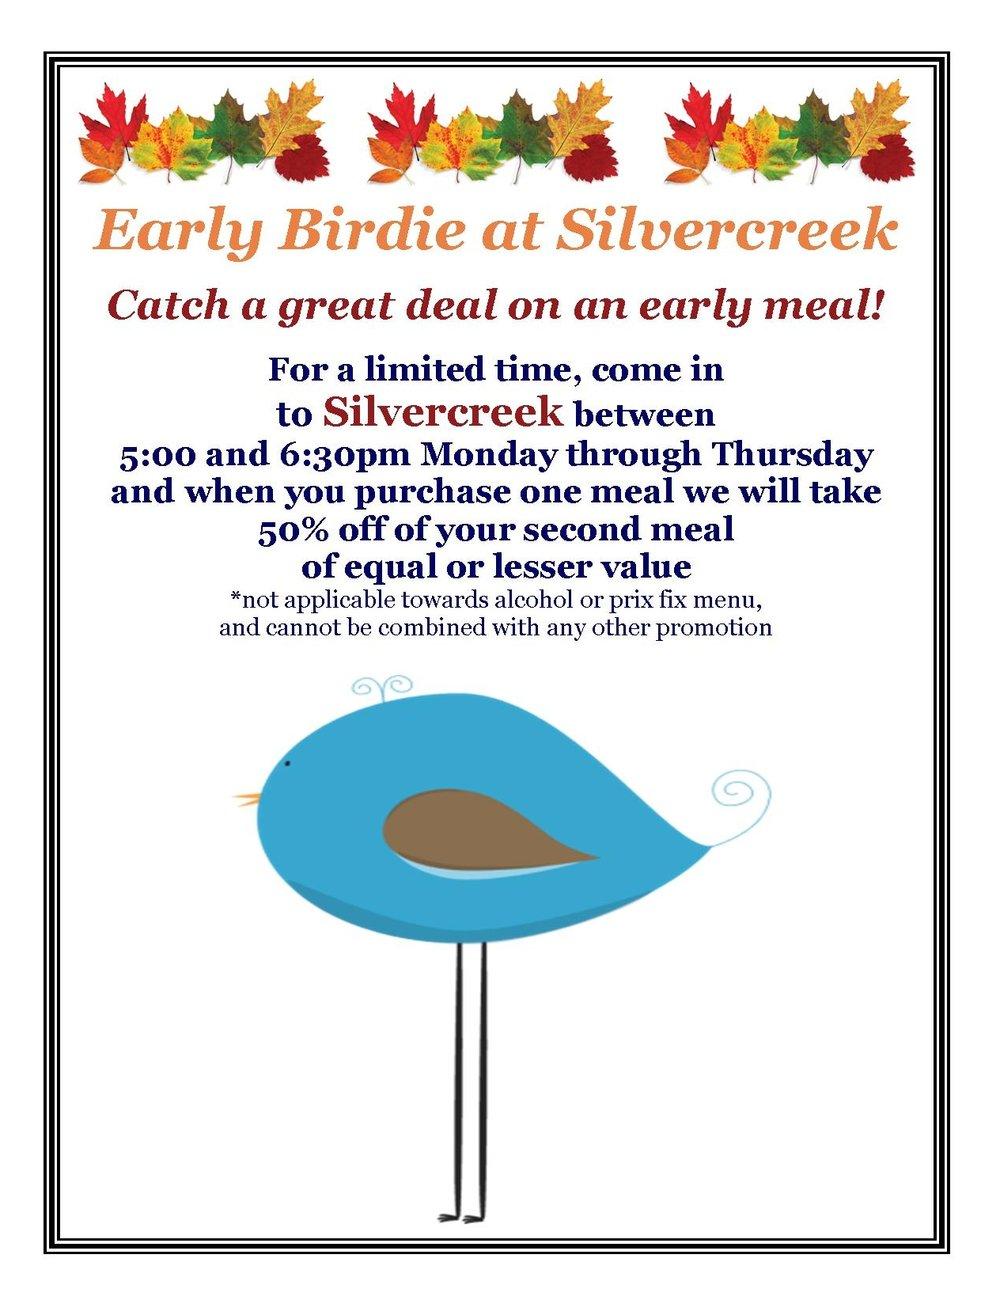 Early Bird Flyer 9.2017.jpg